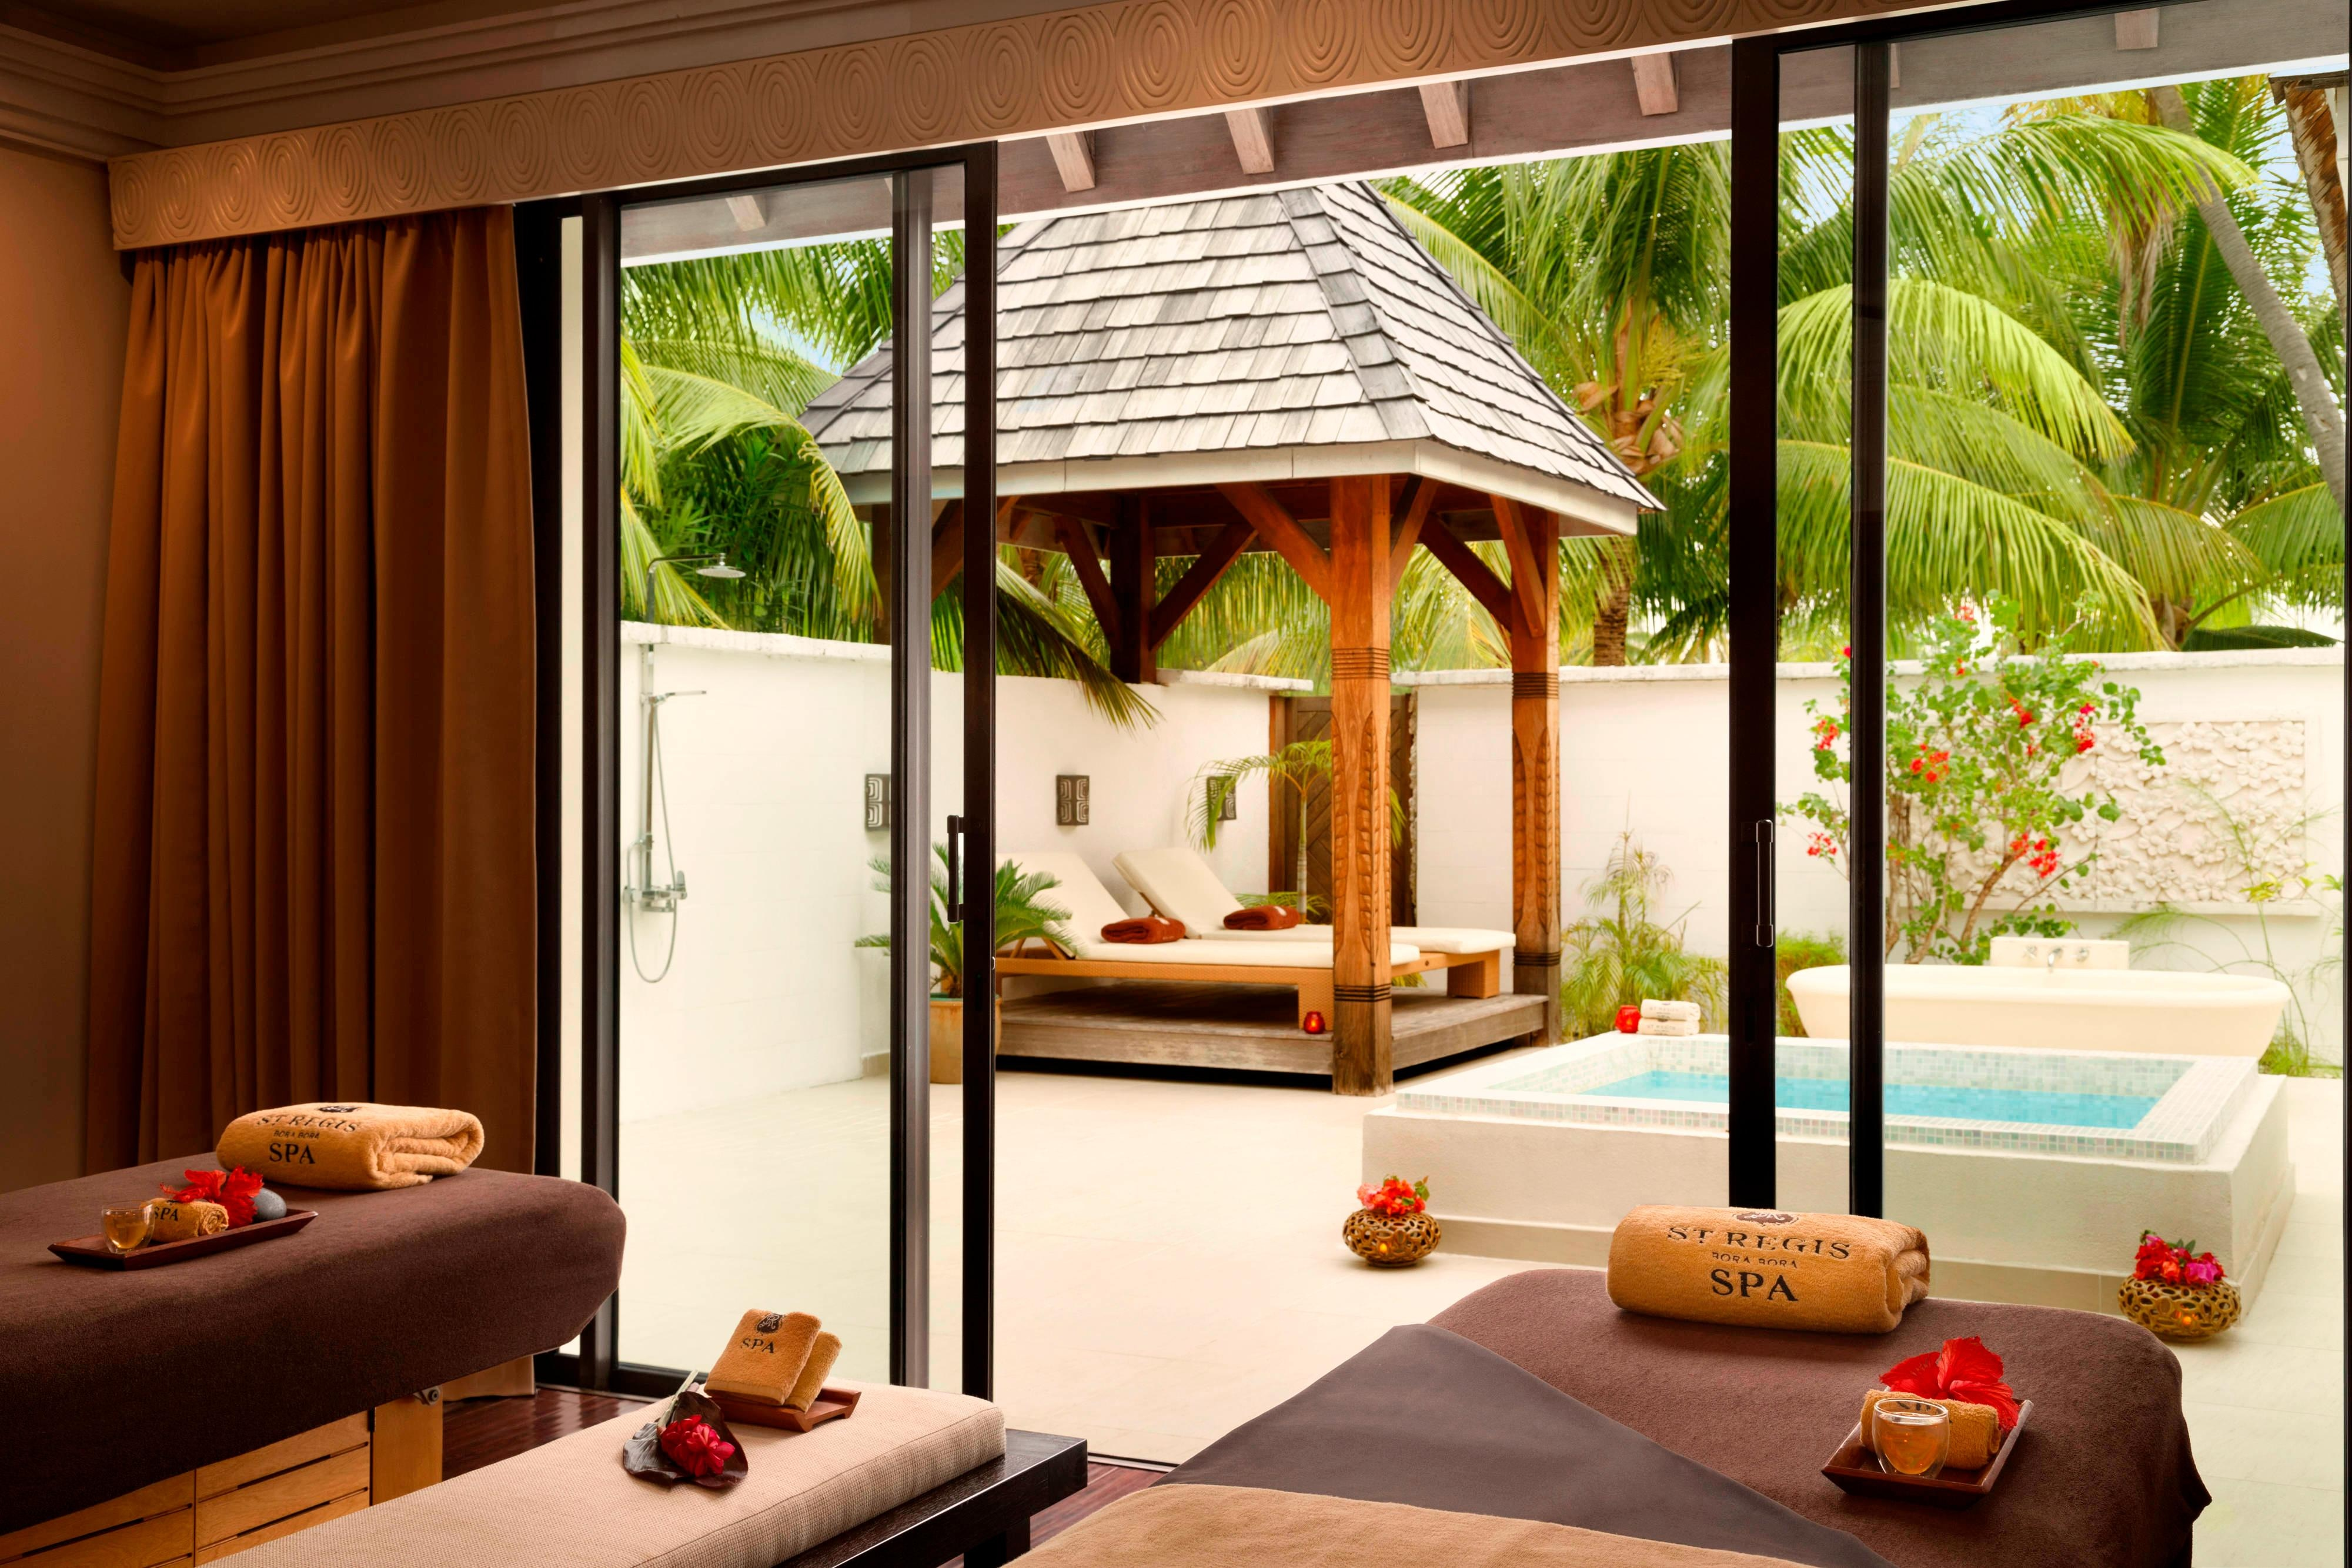 Miri Miri Spa by Clarins - Treatment Room